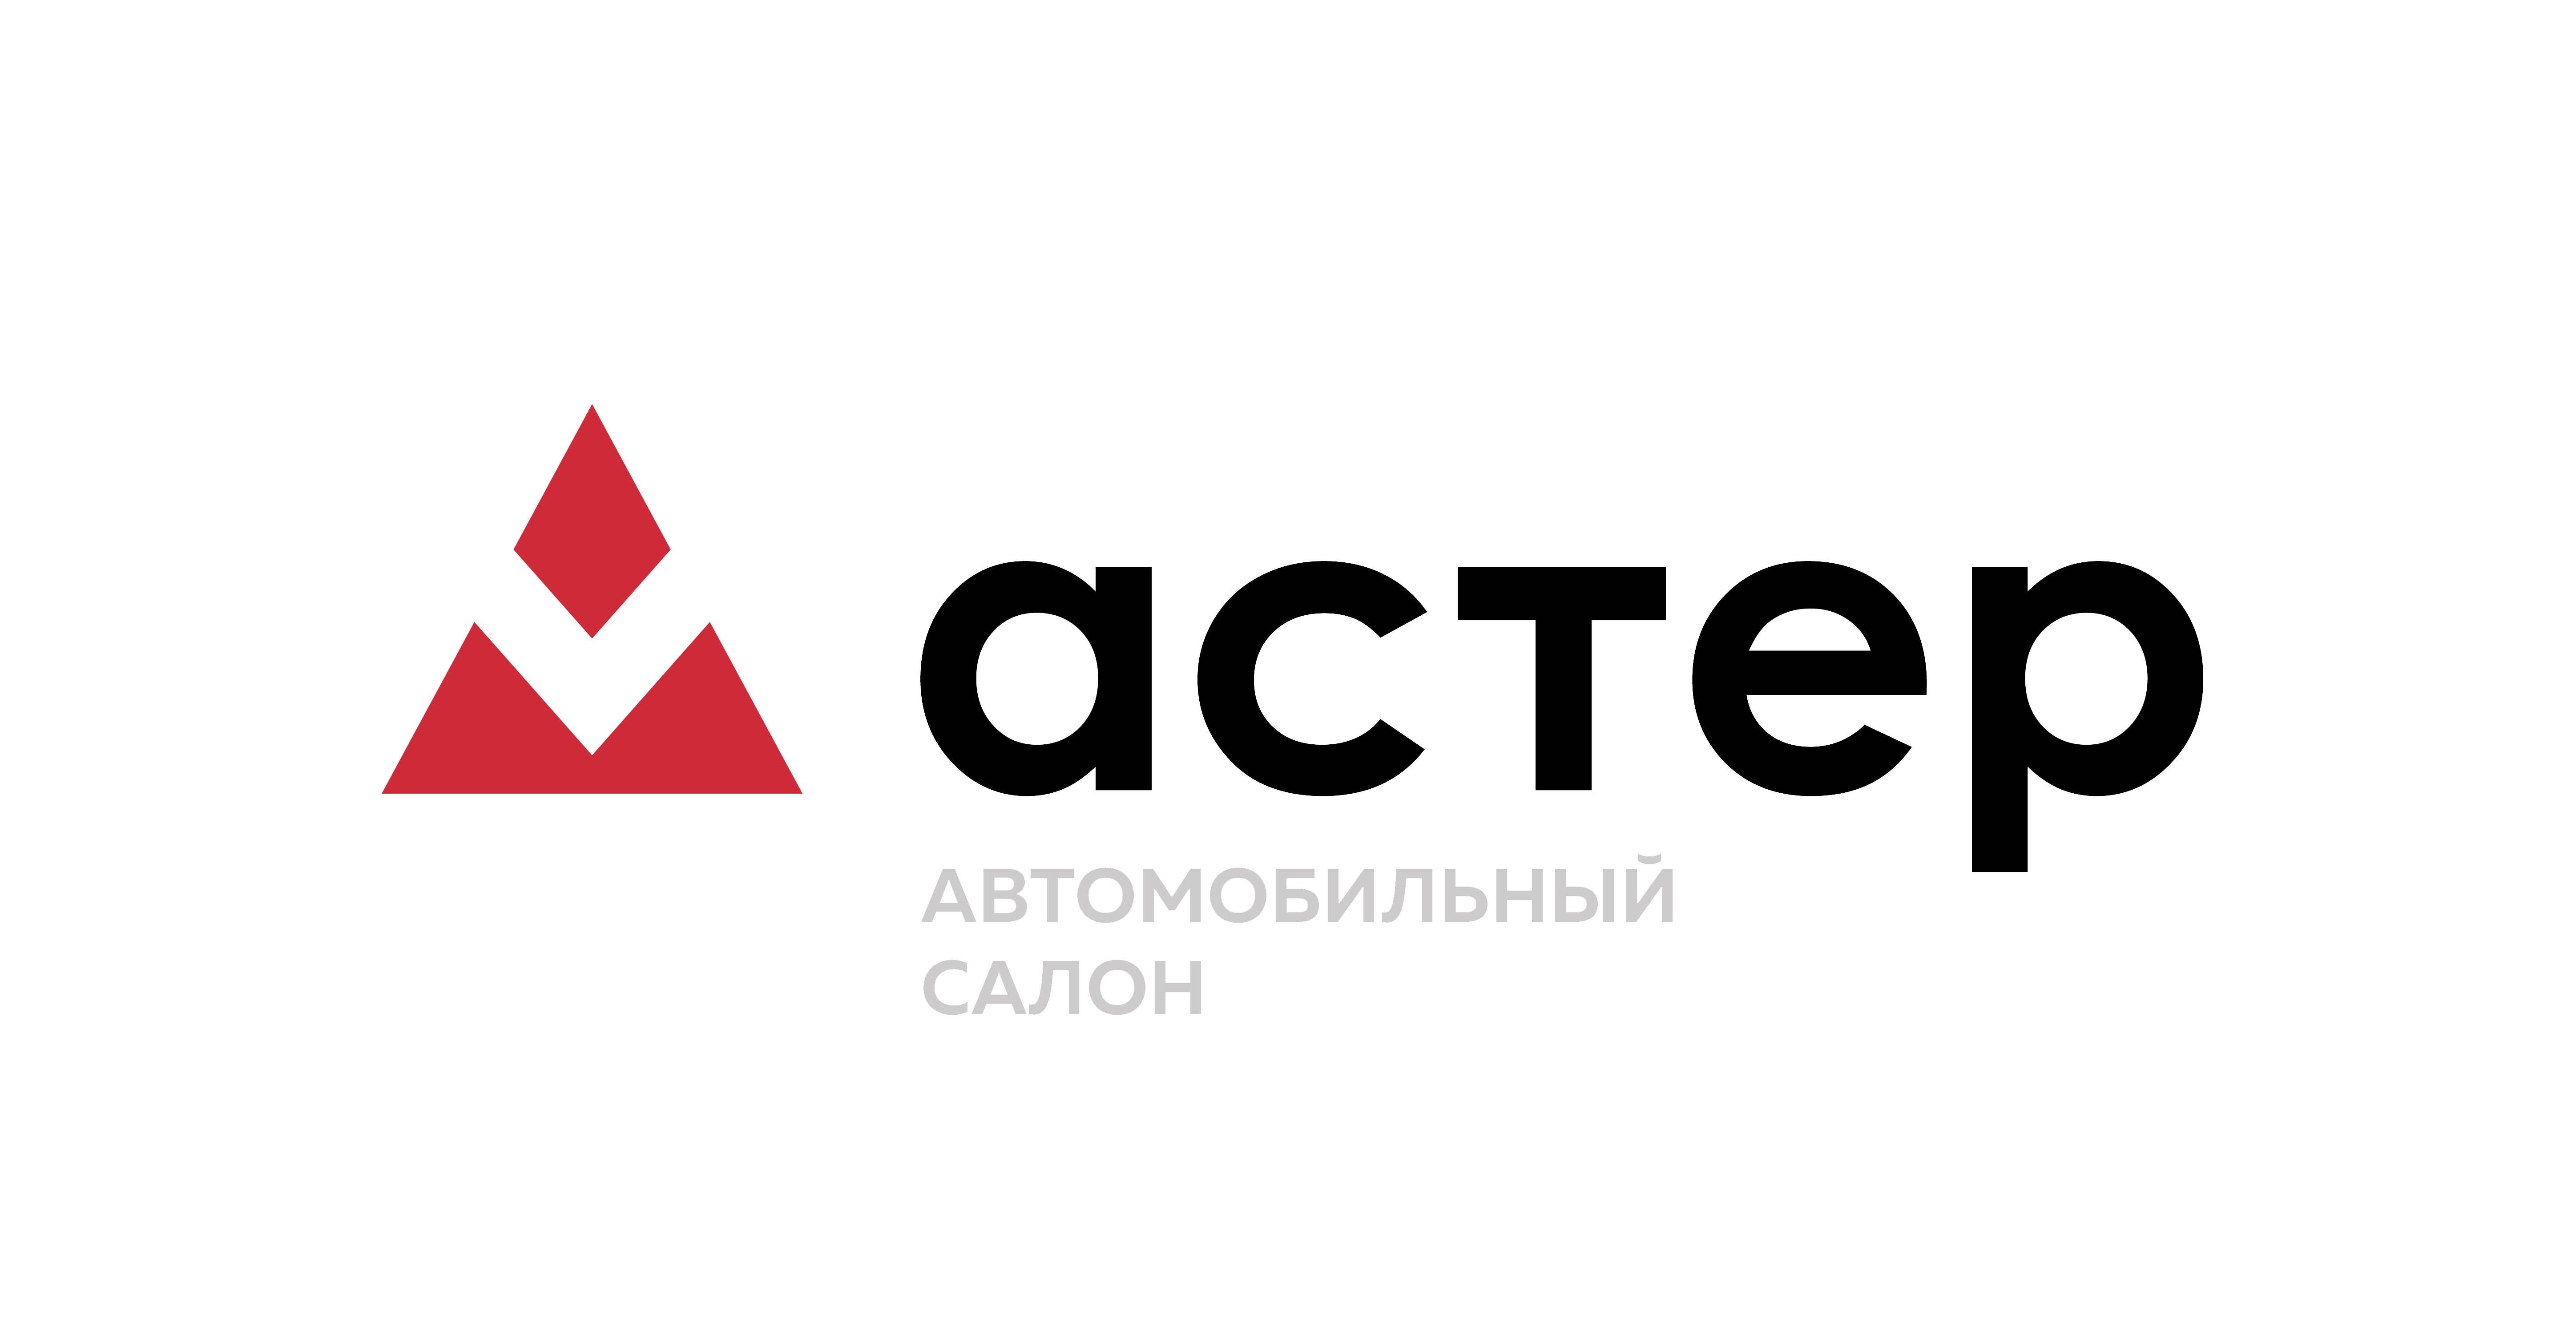 Логотип Астеравто